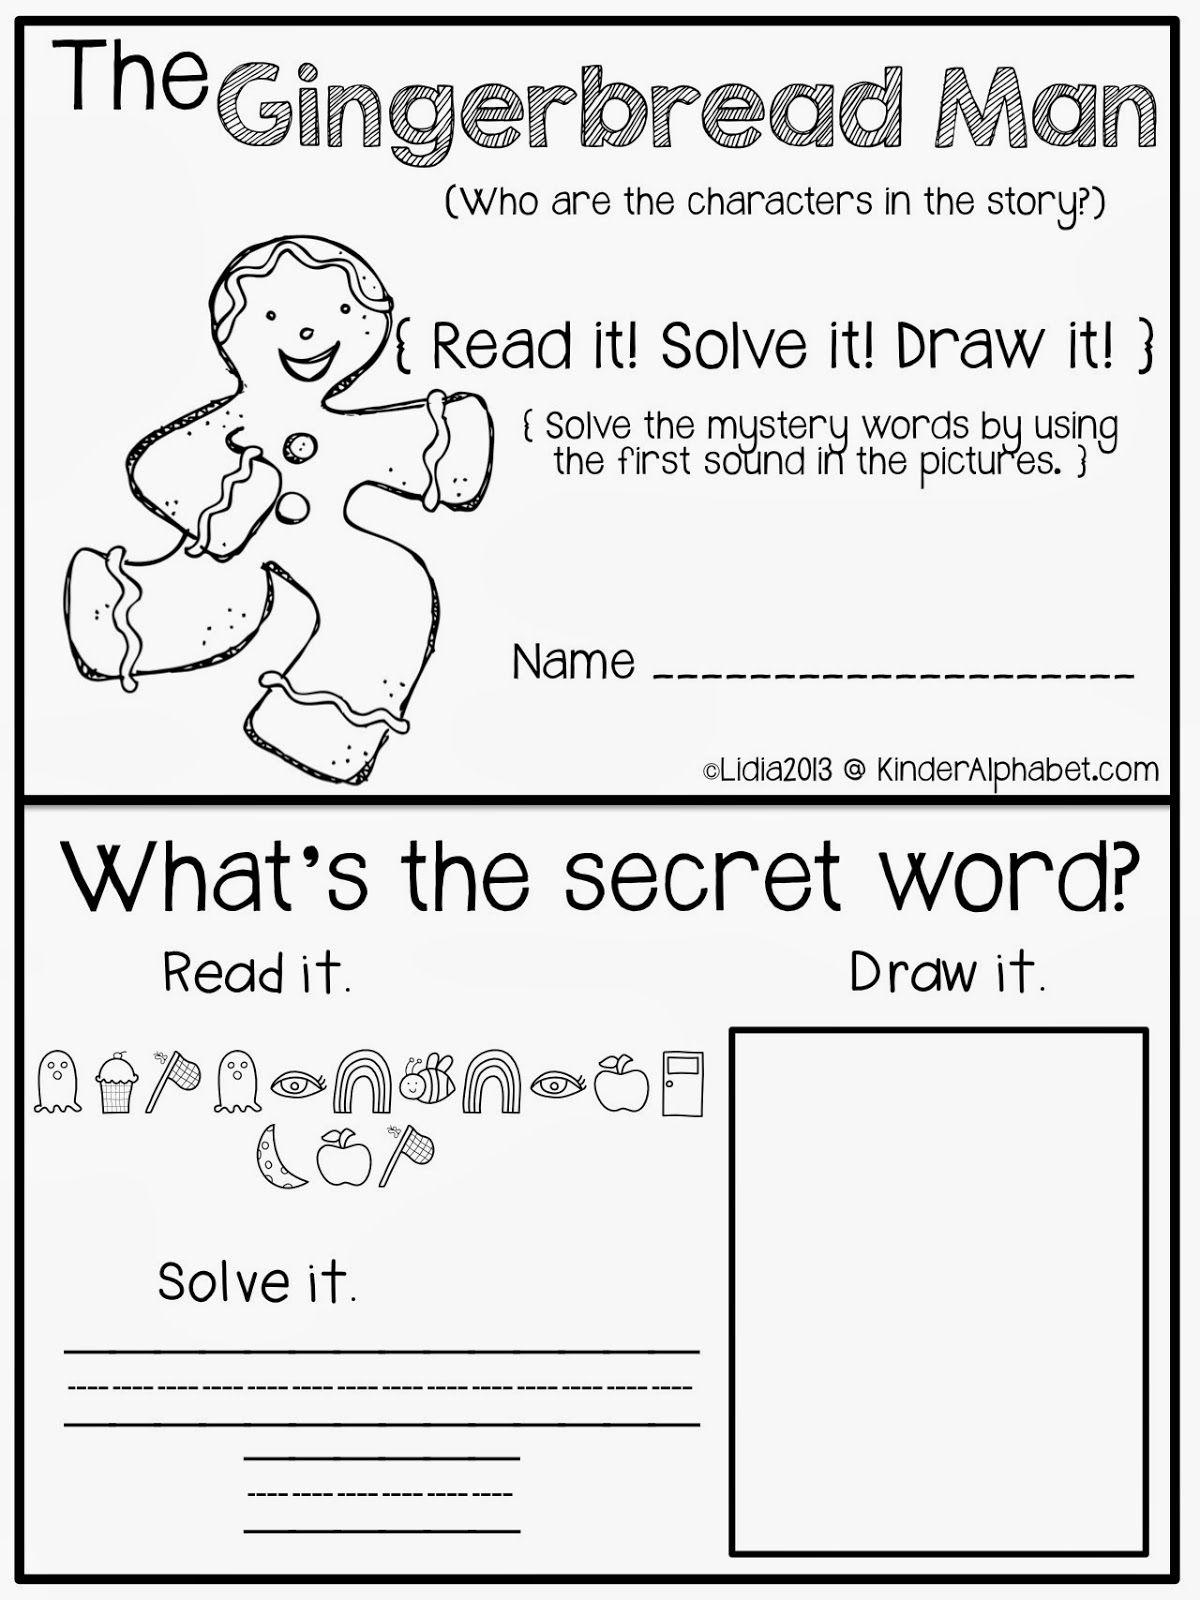 Kinder Alphabet Free Christmas Printables